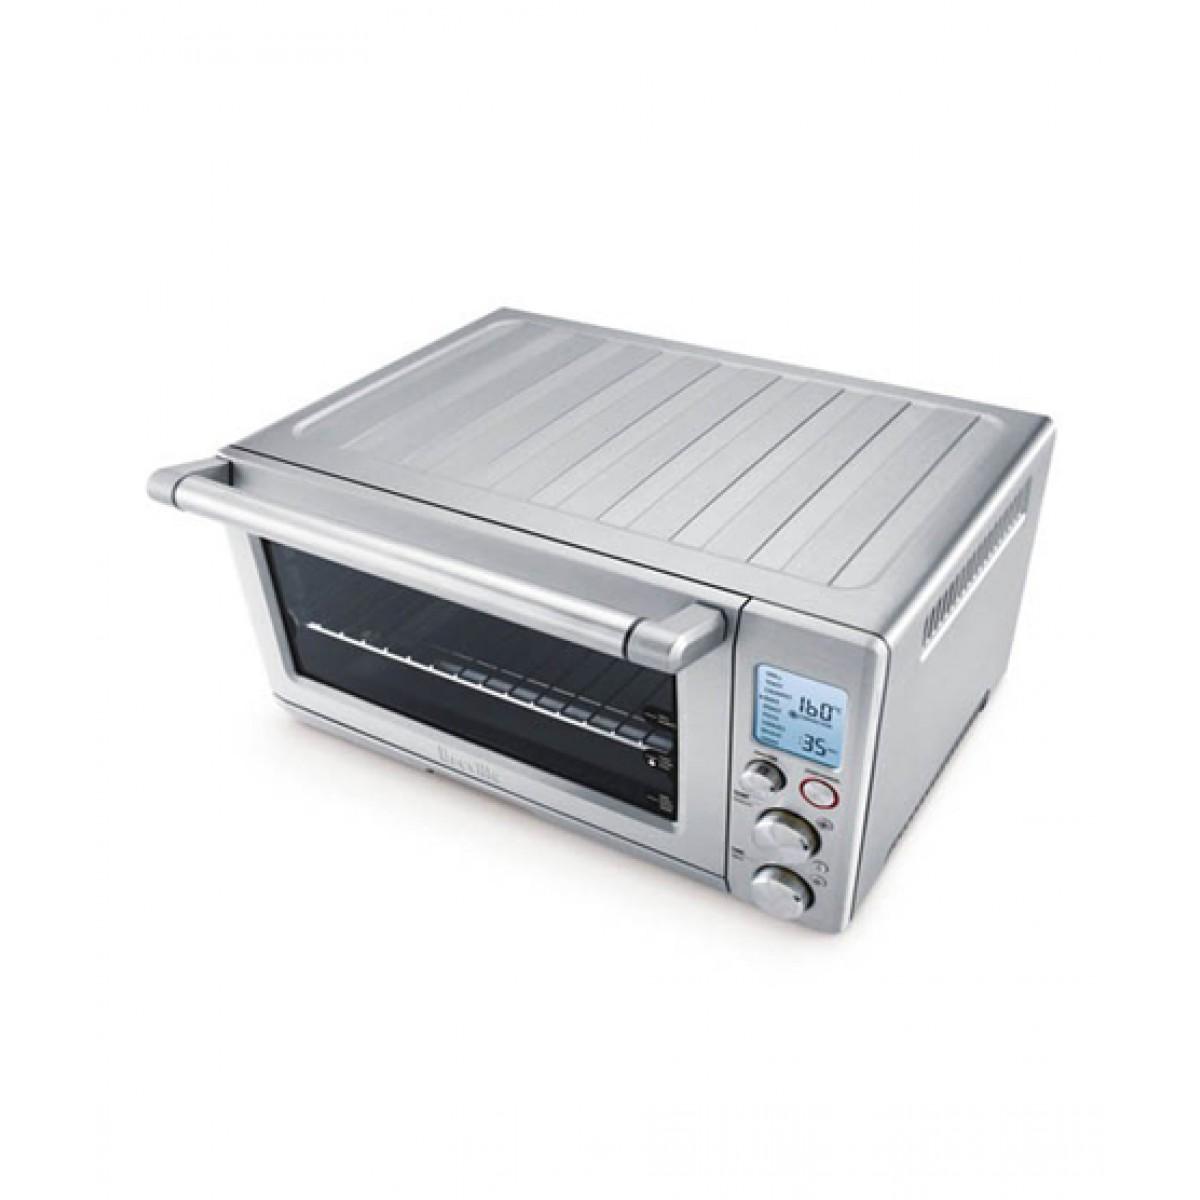 Breville The Smart Oven 22 Ltr Bov800 Price In Pakistan